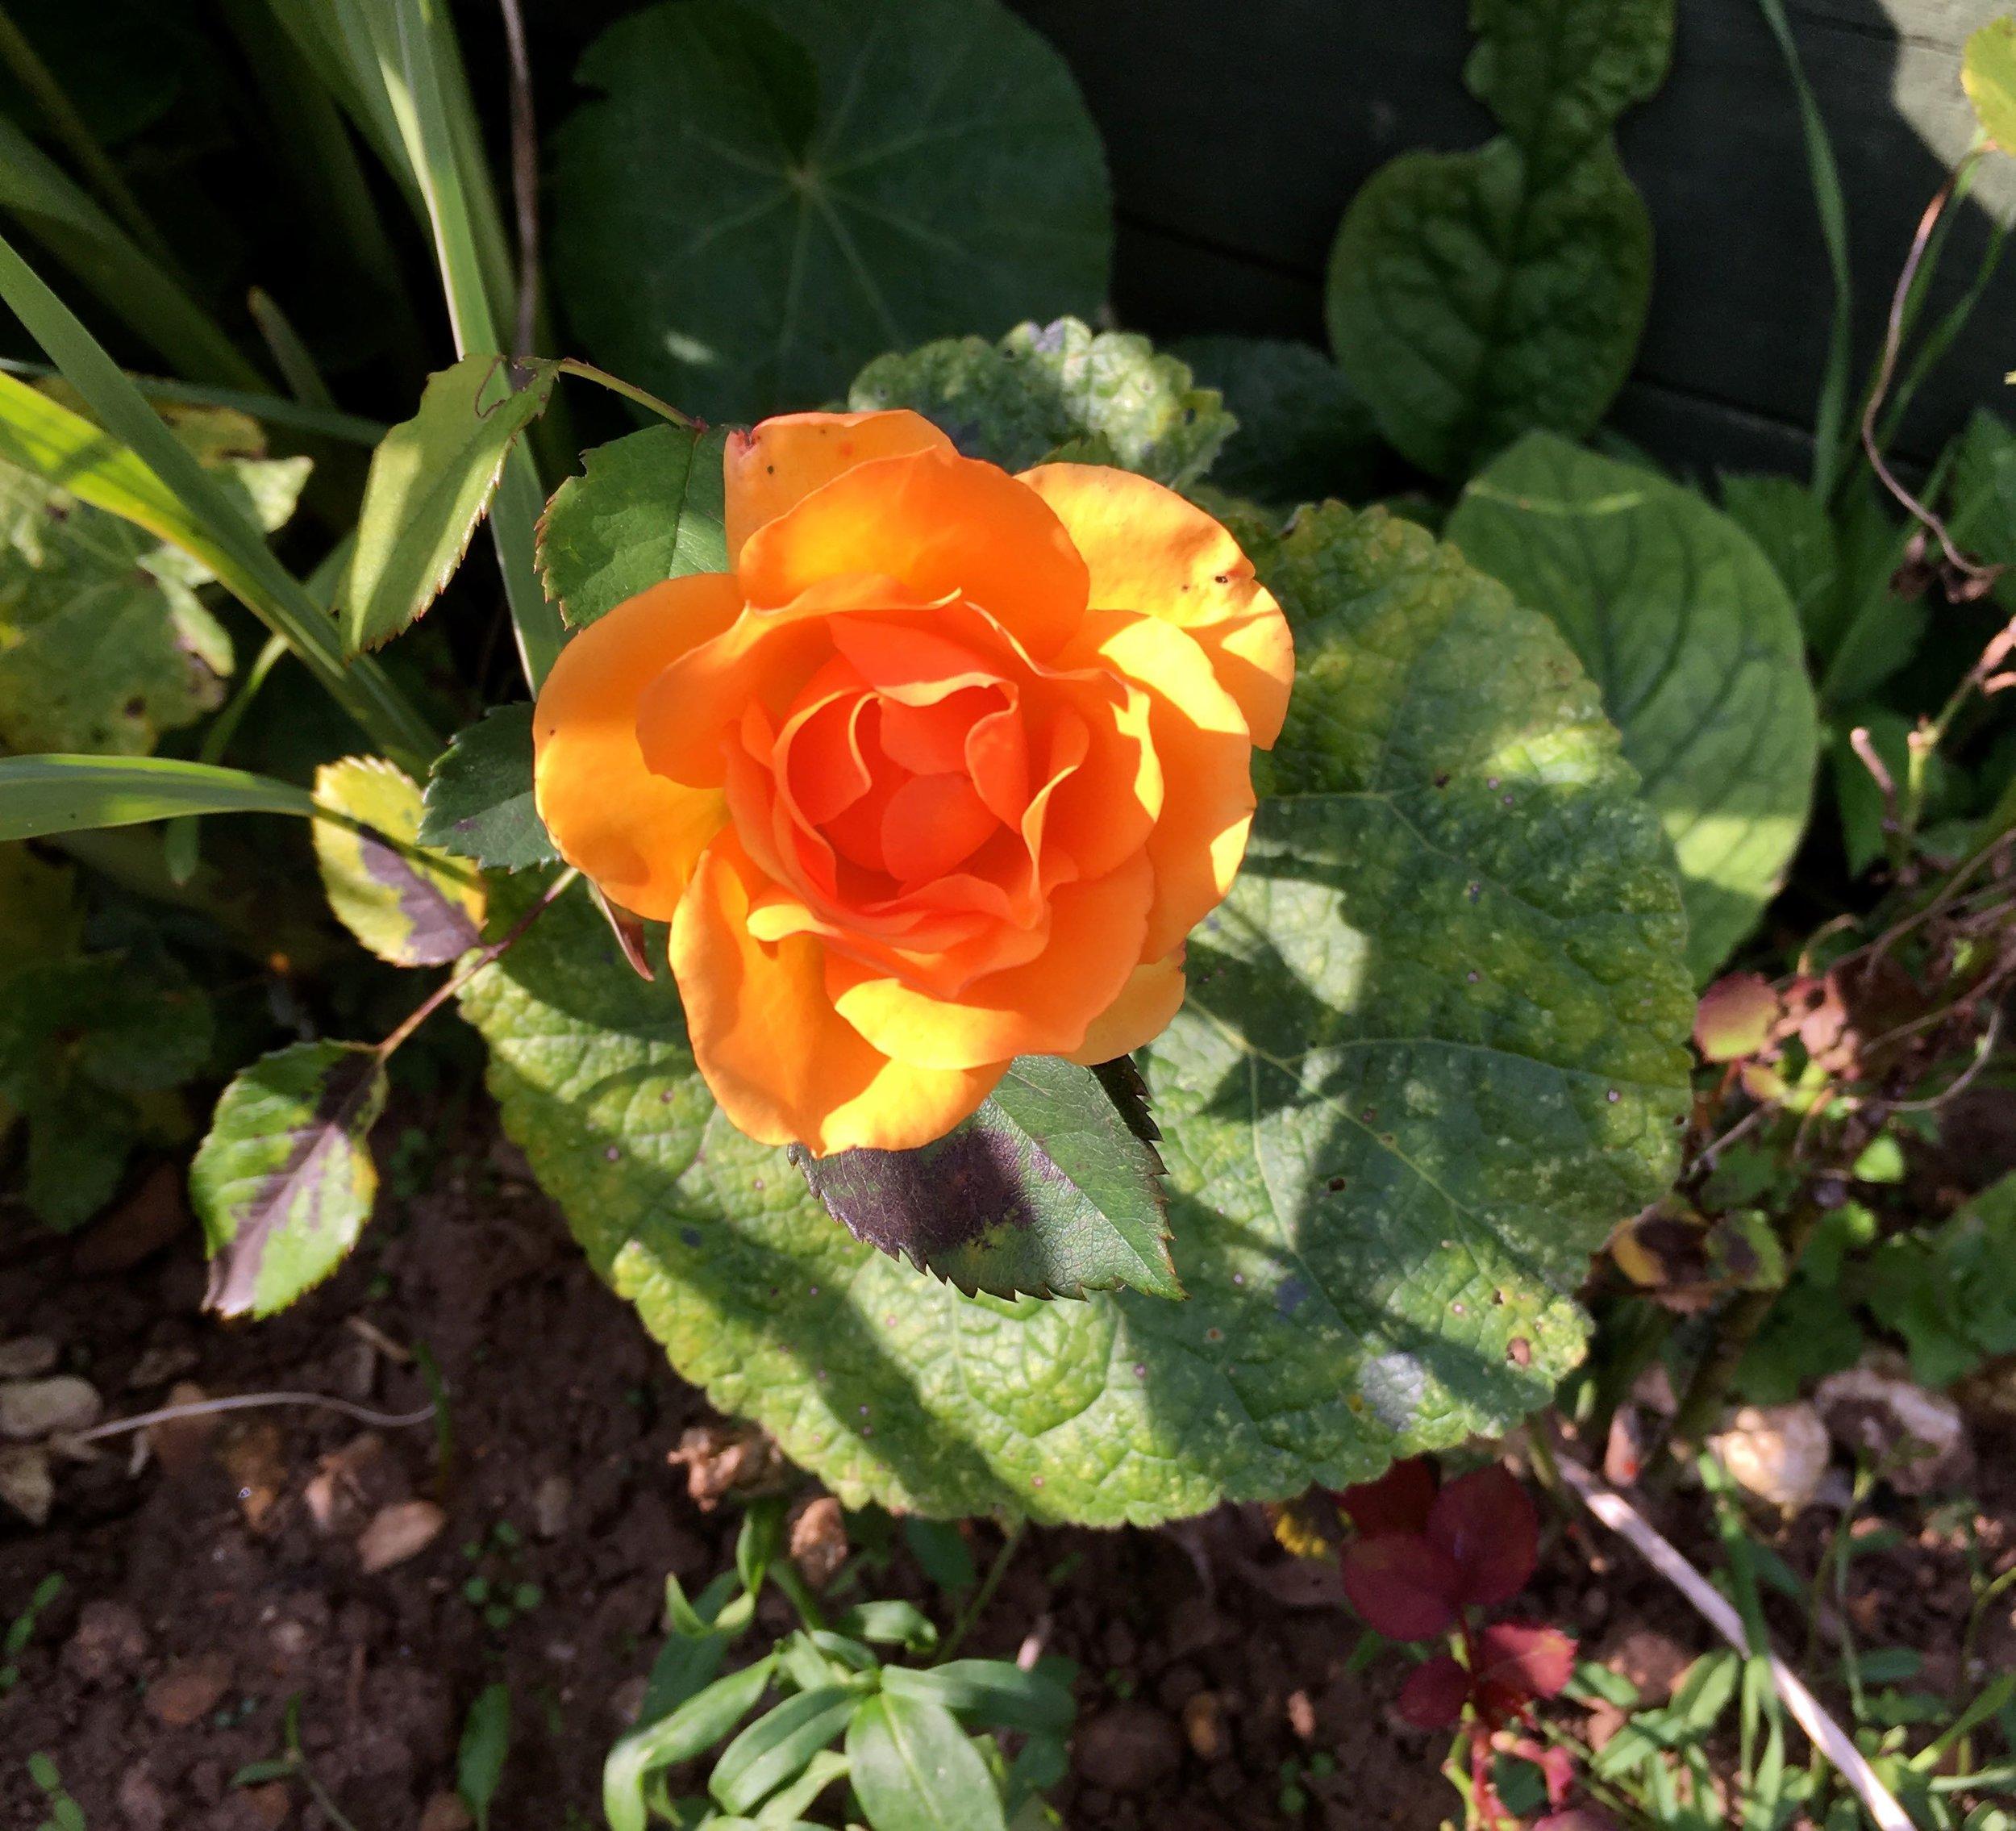 a small orange rose looking stunning in dad's norfolk garden